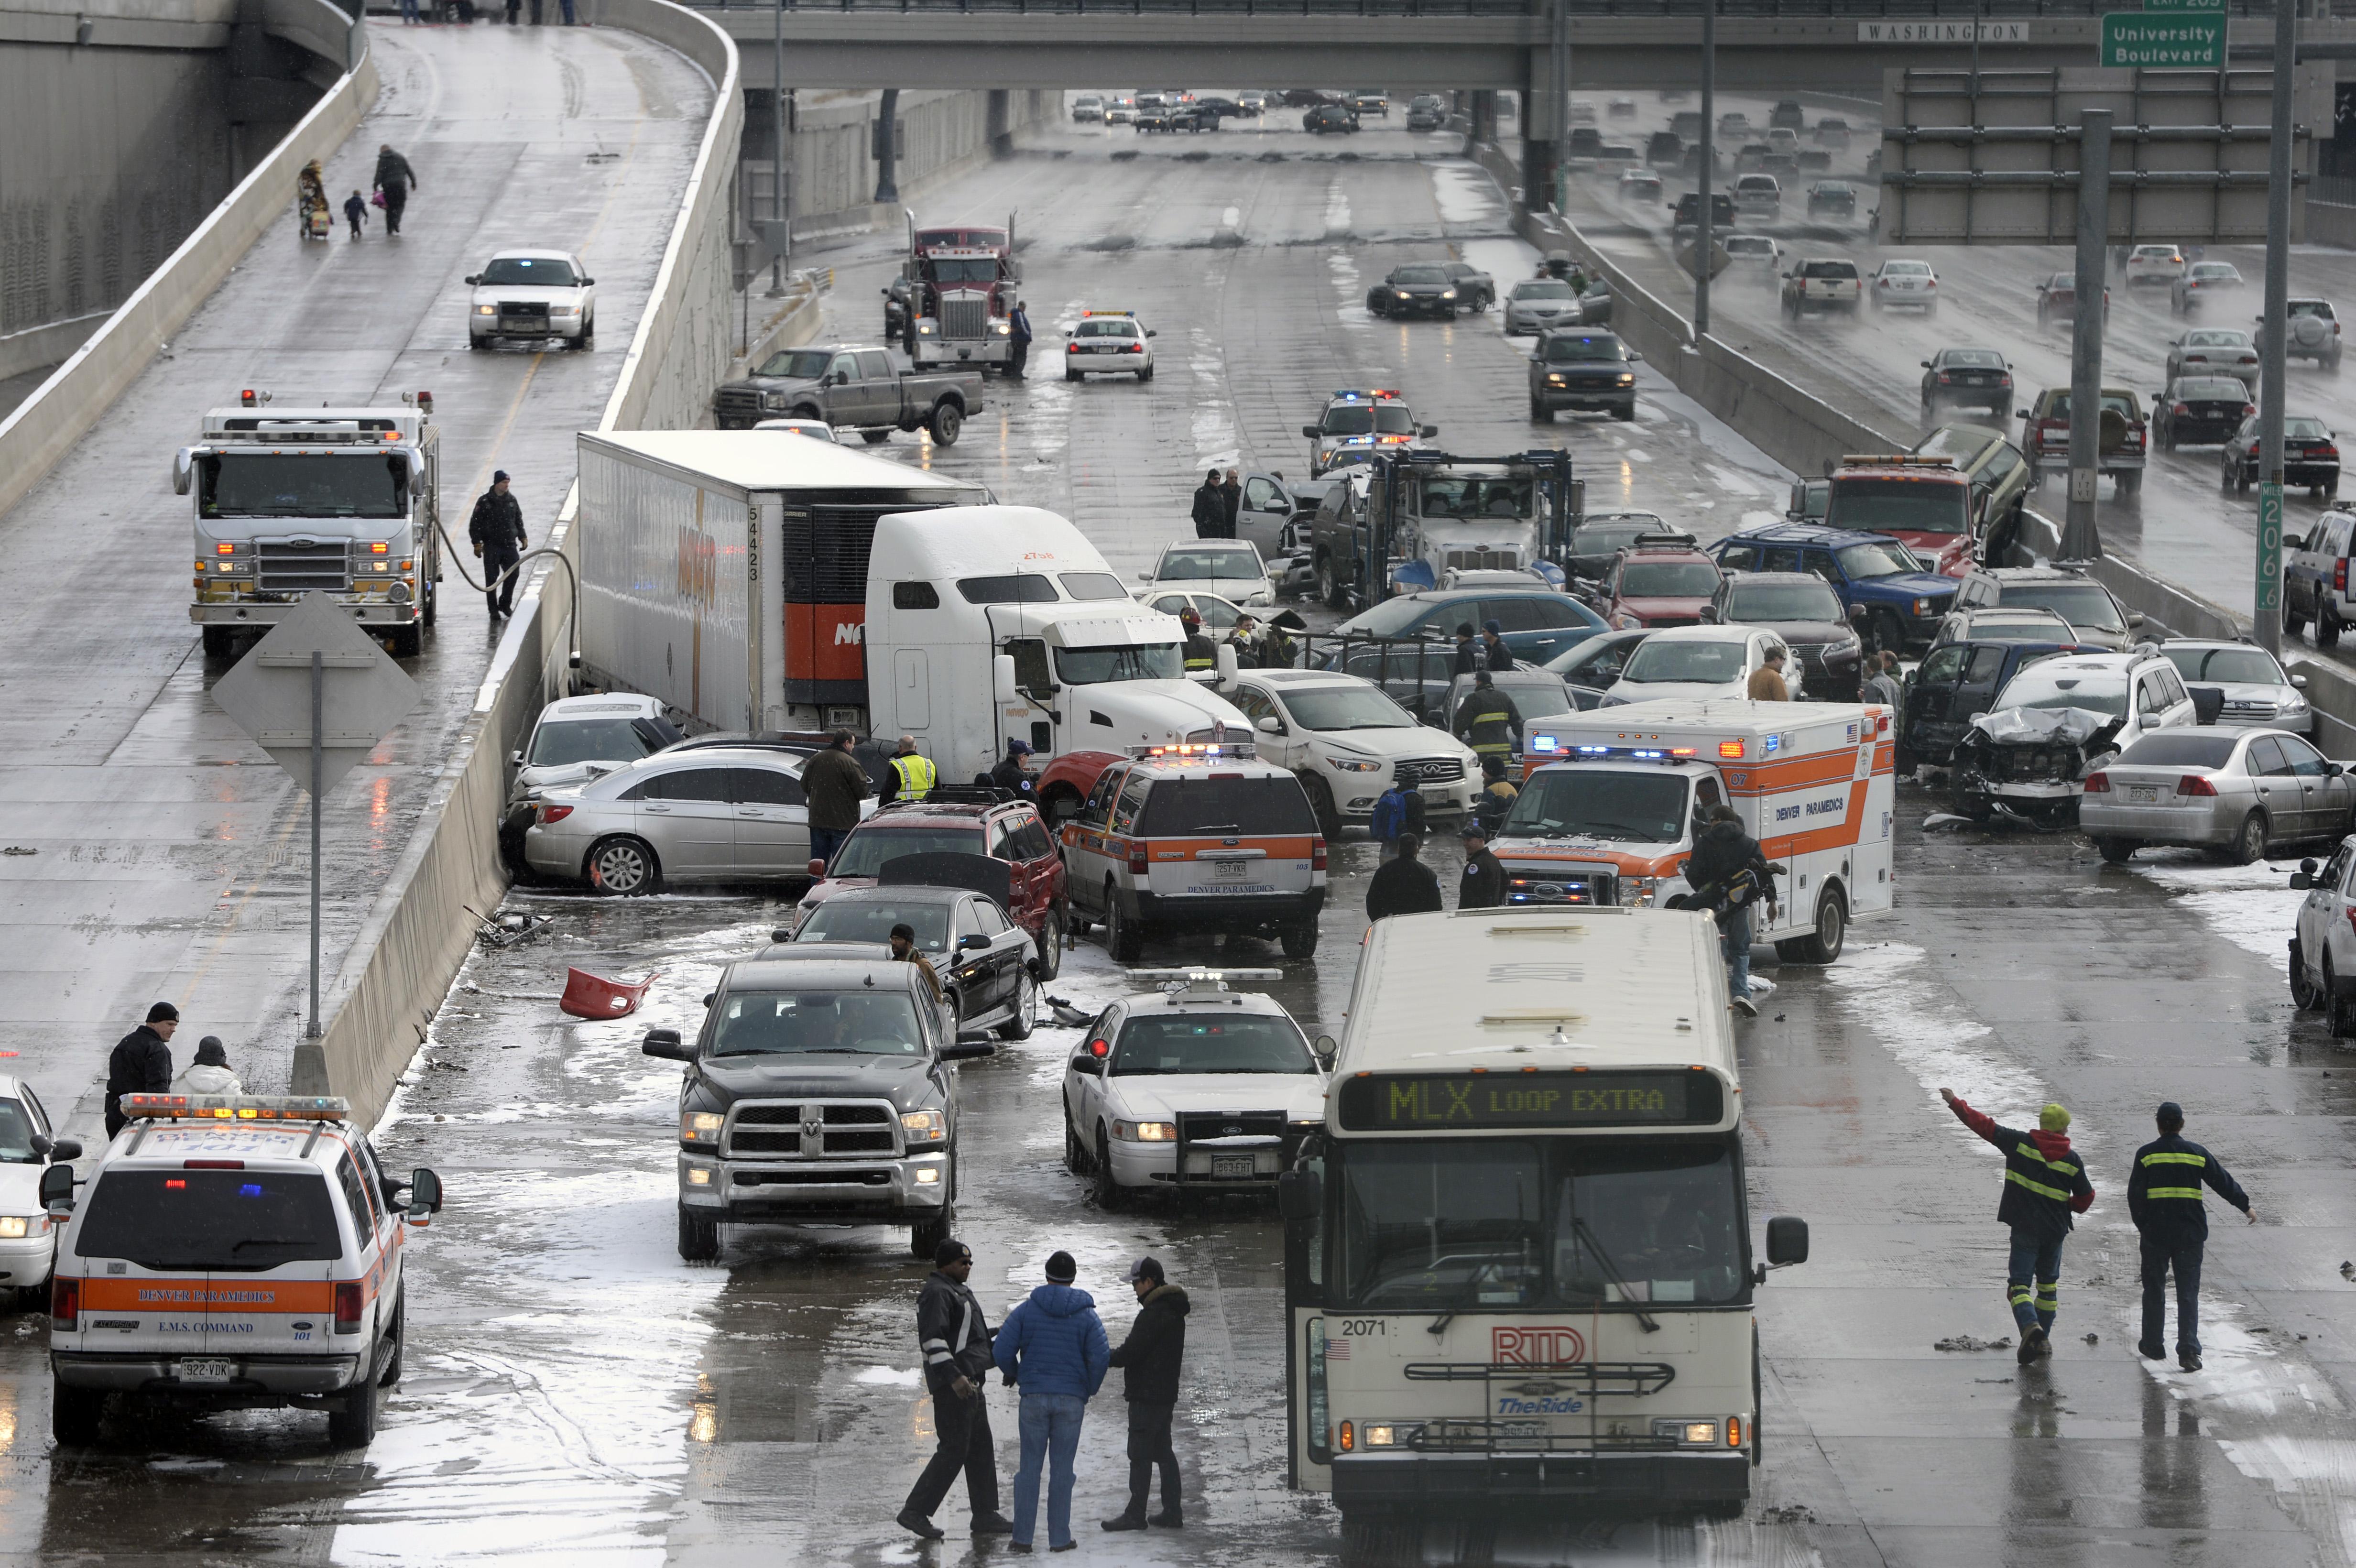 Denver - 1 Killed, 30 Injured In Massive Colorado Pileup